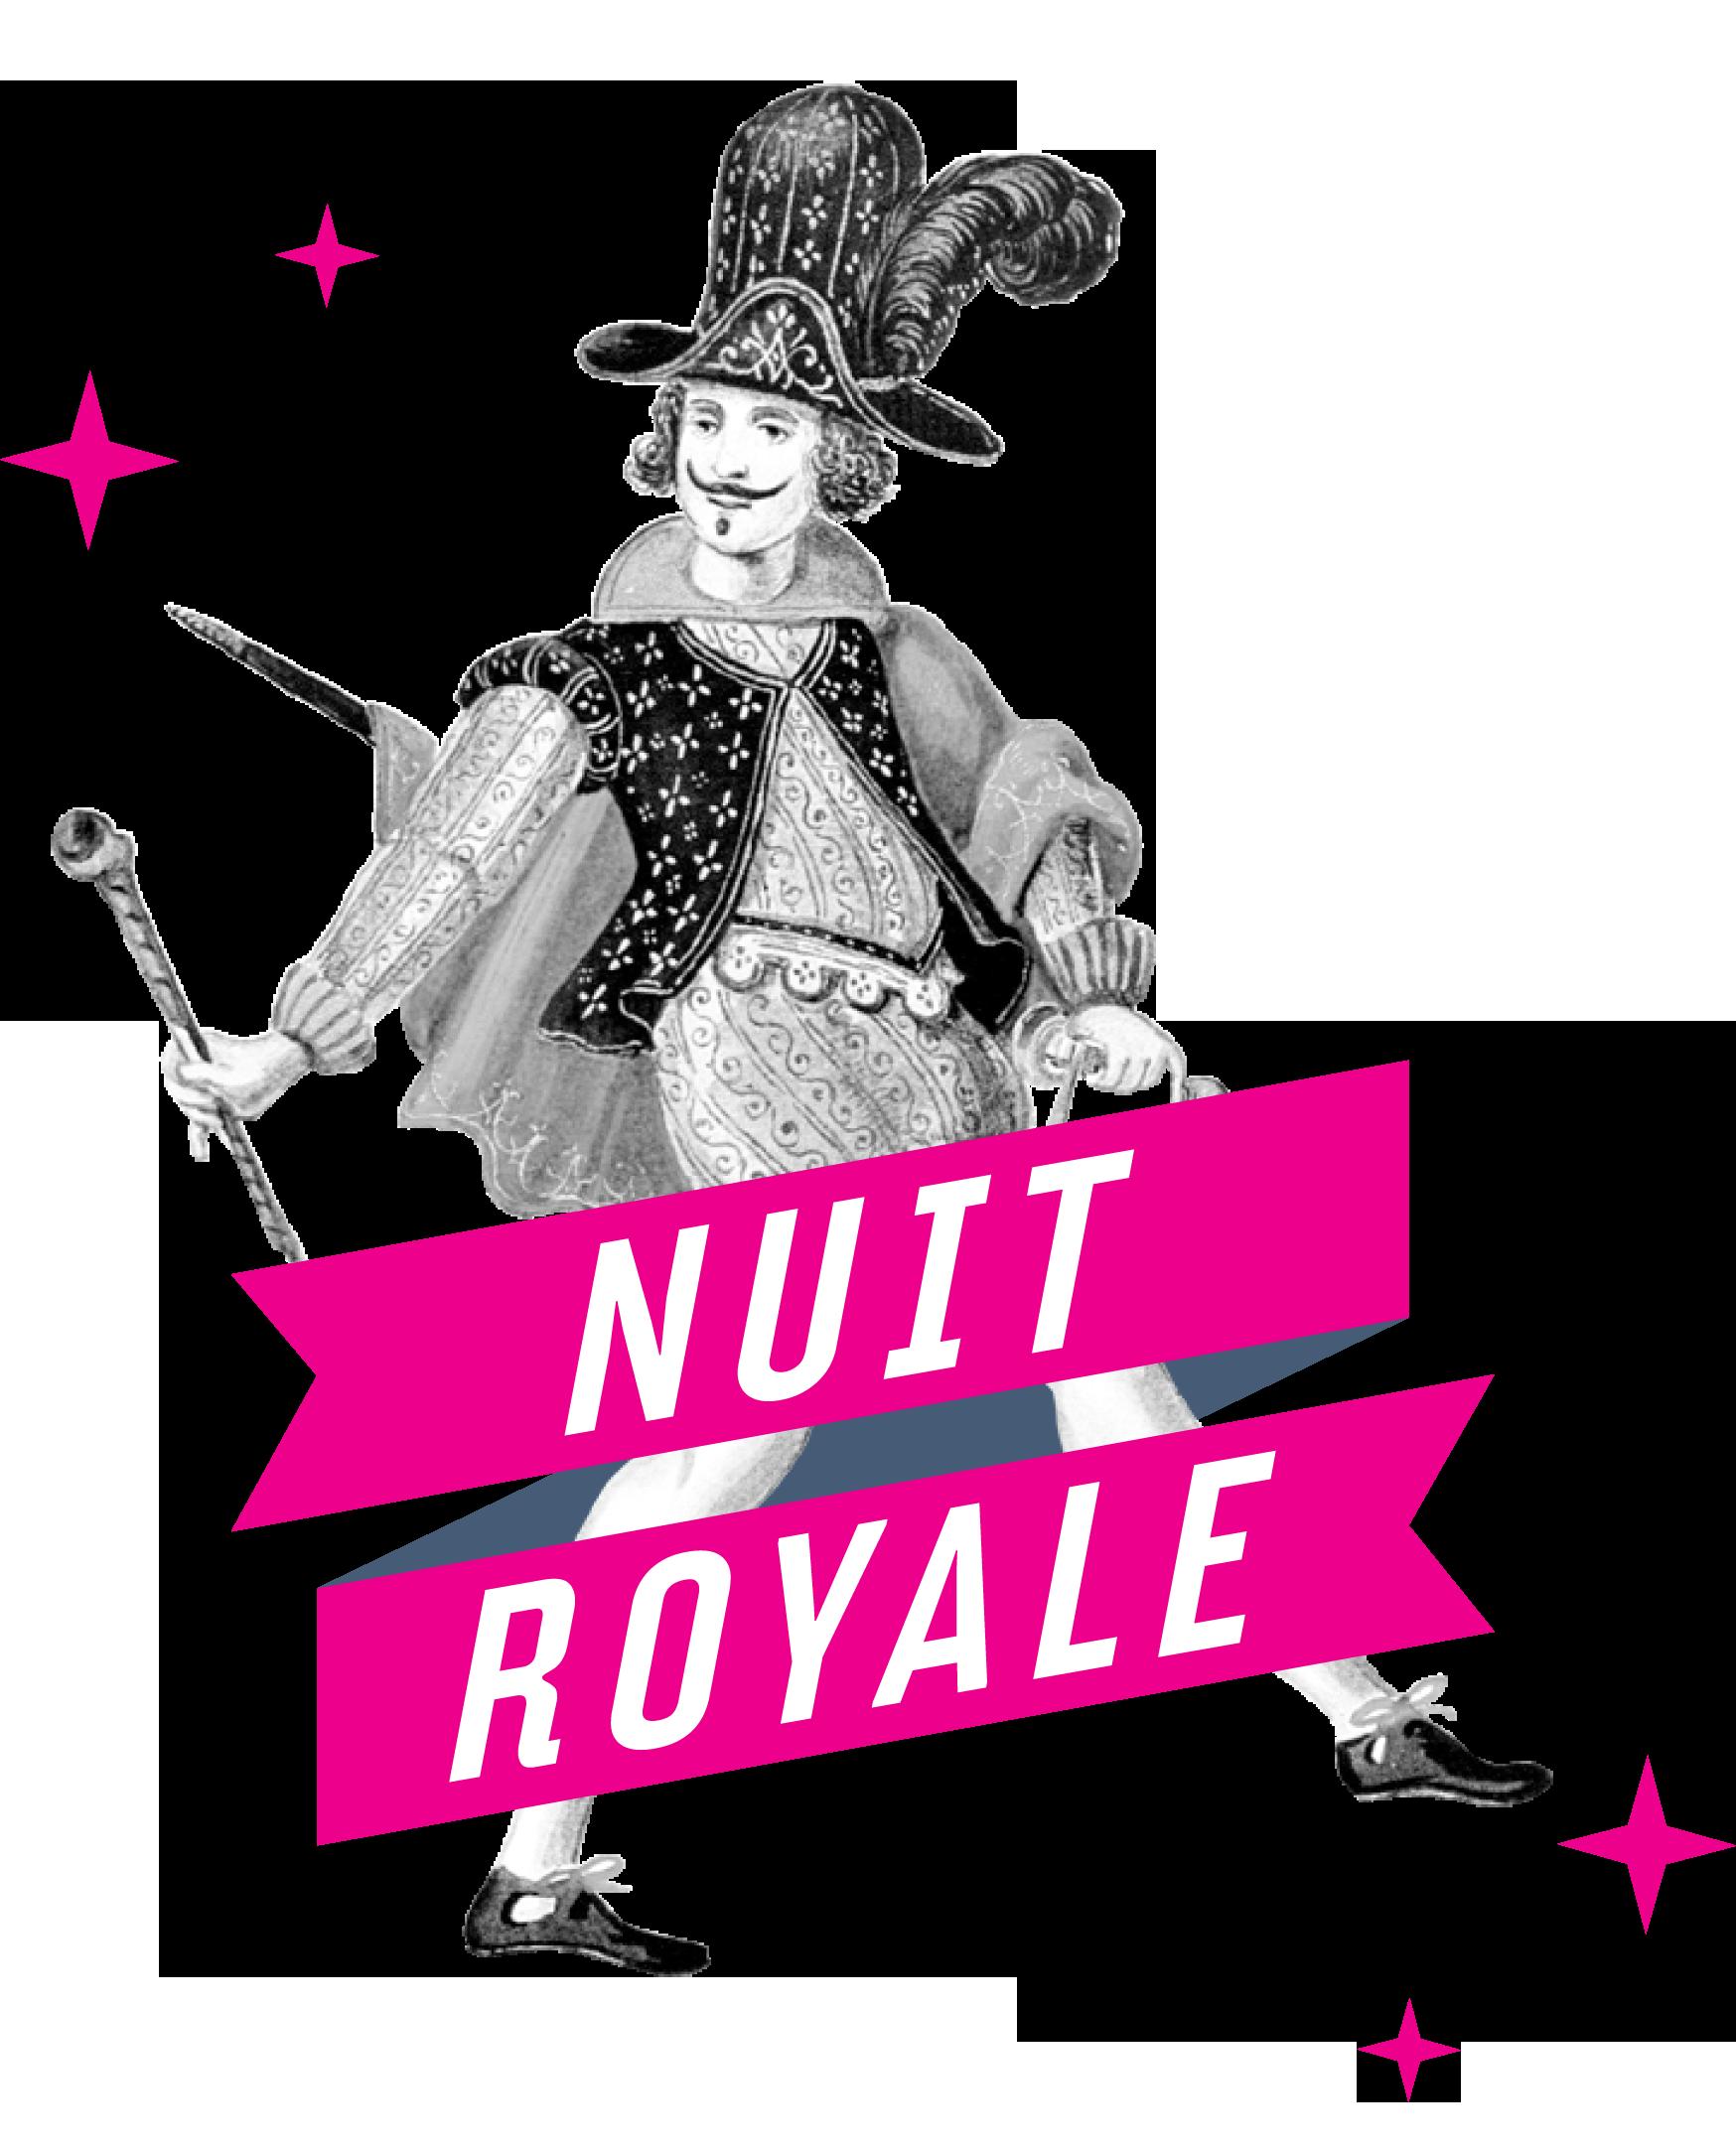 NUIT ROYALE